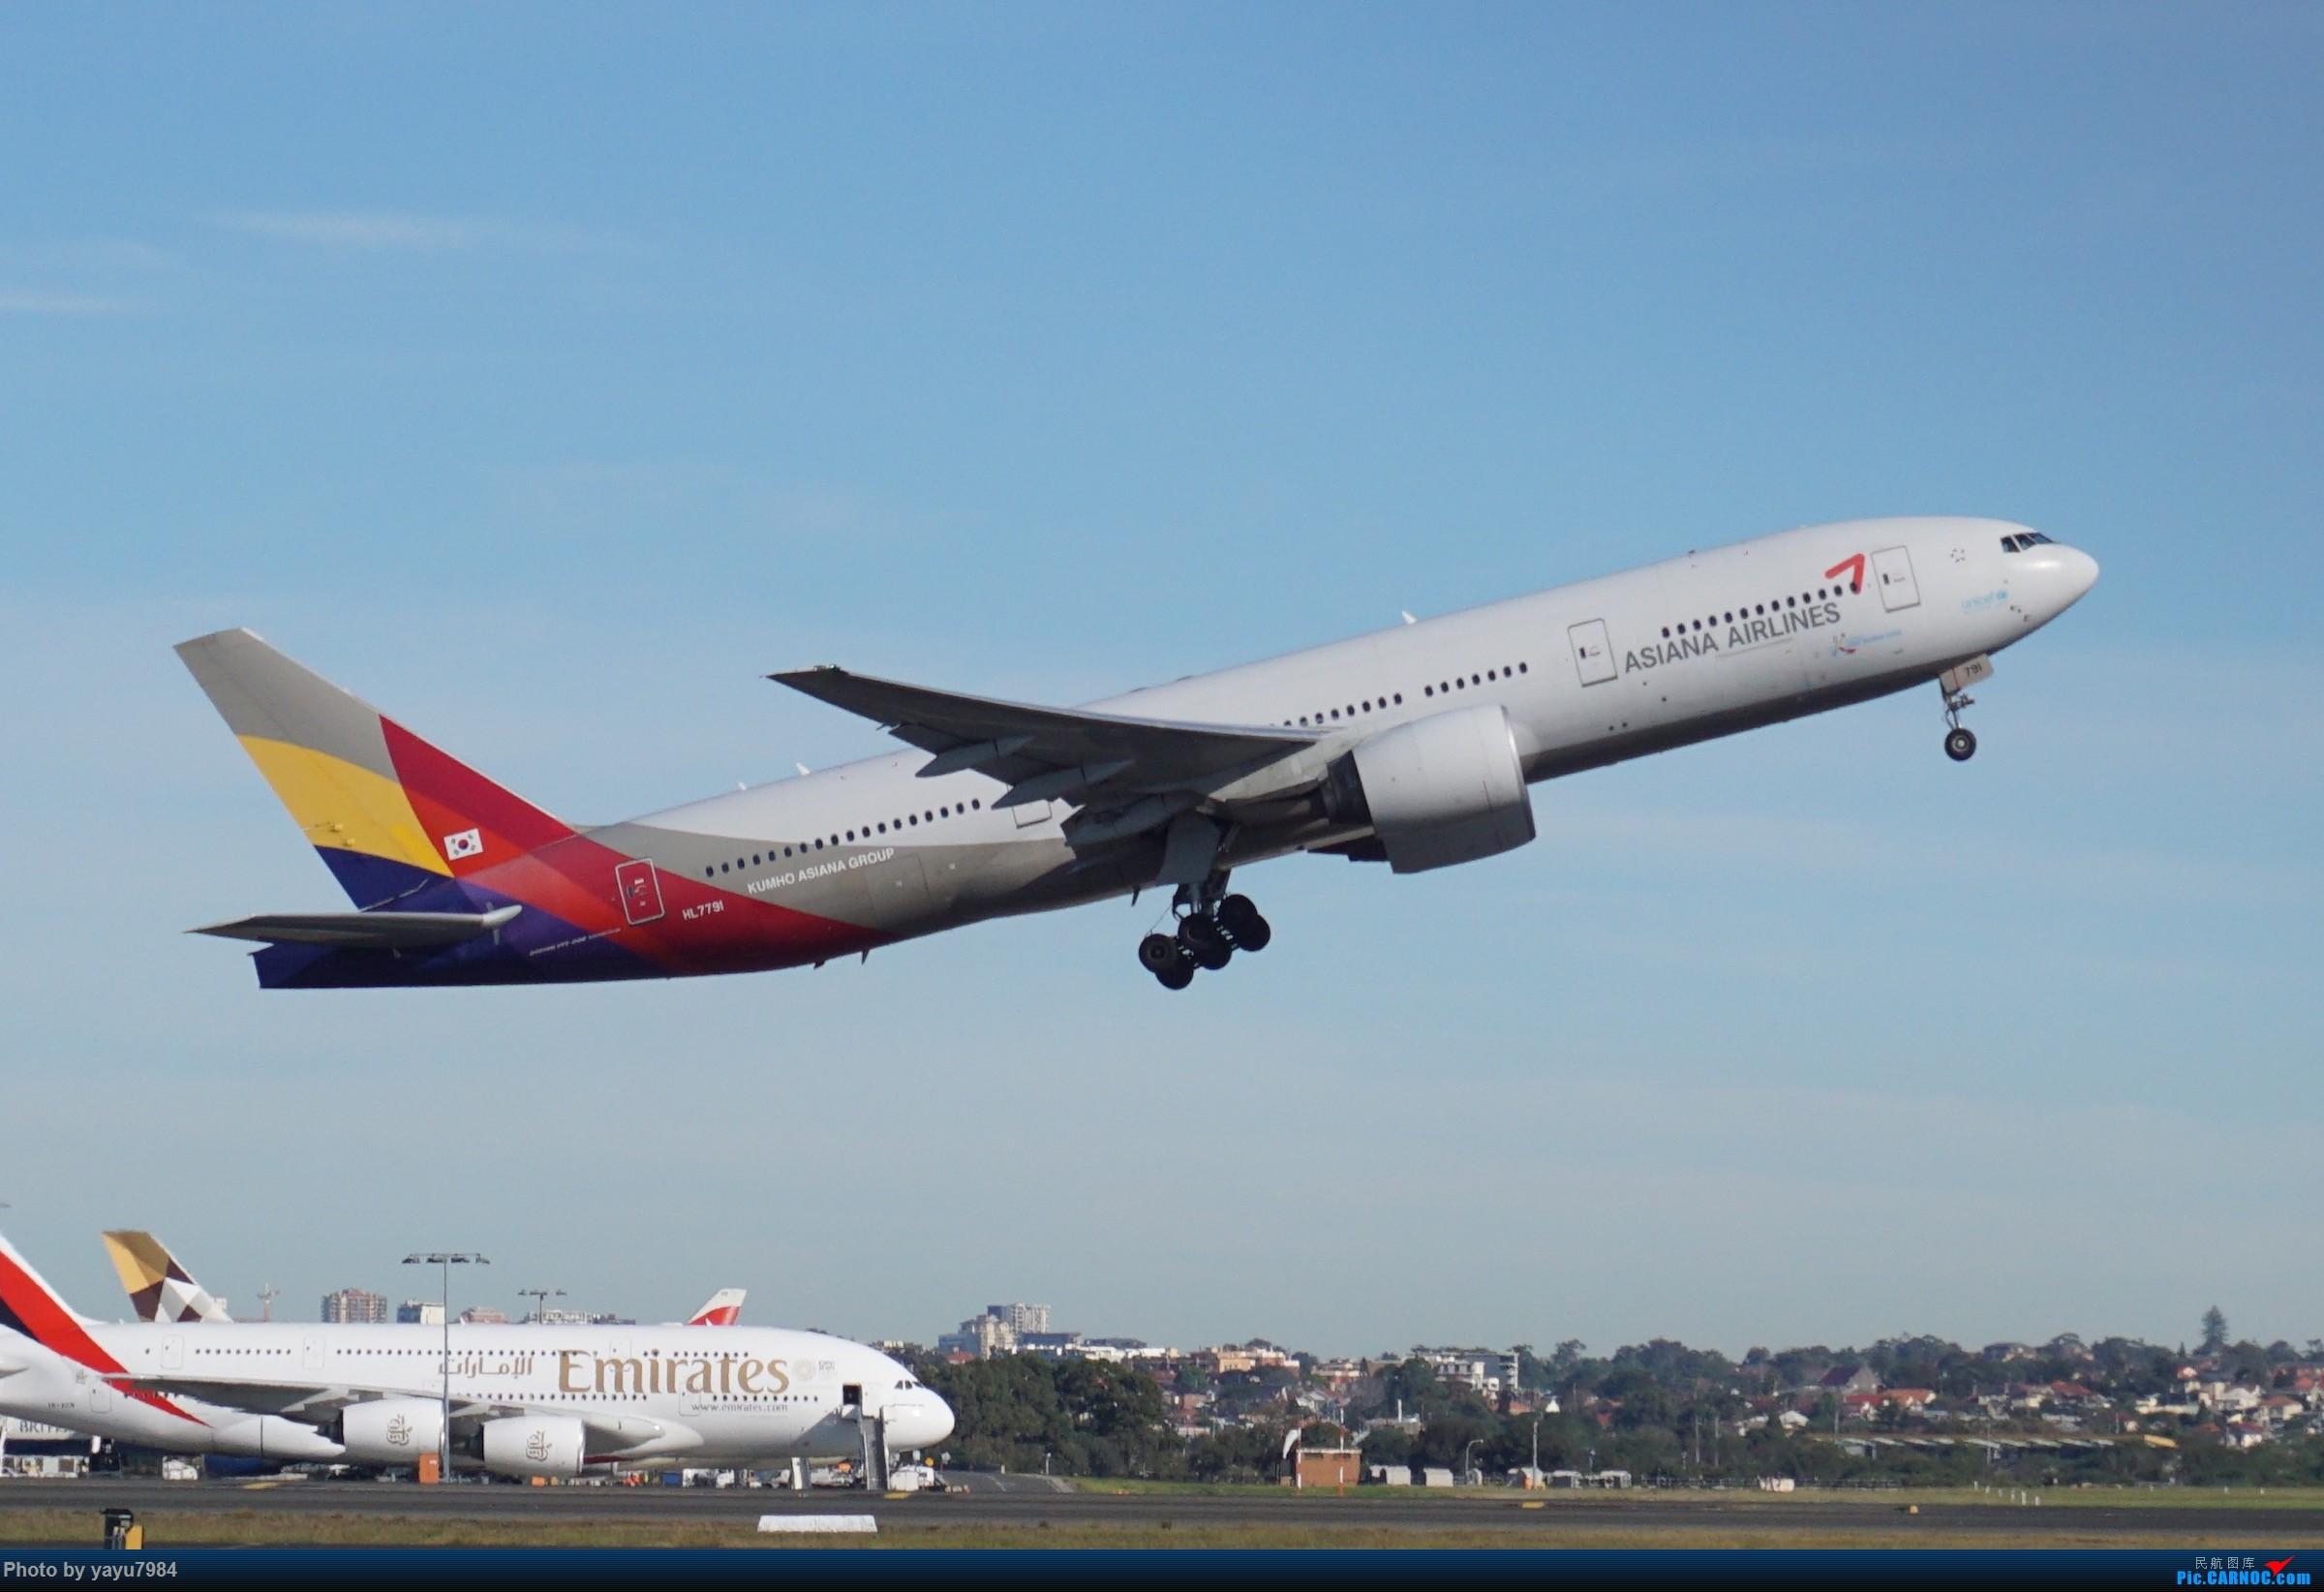 Re:[原创][SYD] 晨悉尼,Blu Emu停车场里拍34L起飞以及滑行 BOEING 777-200ER HL7791 澳大利亚悉尼金斯福德·史密斯机场